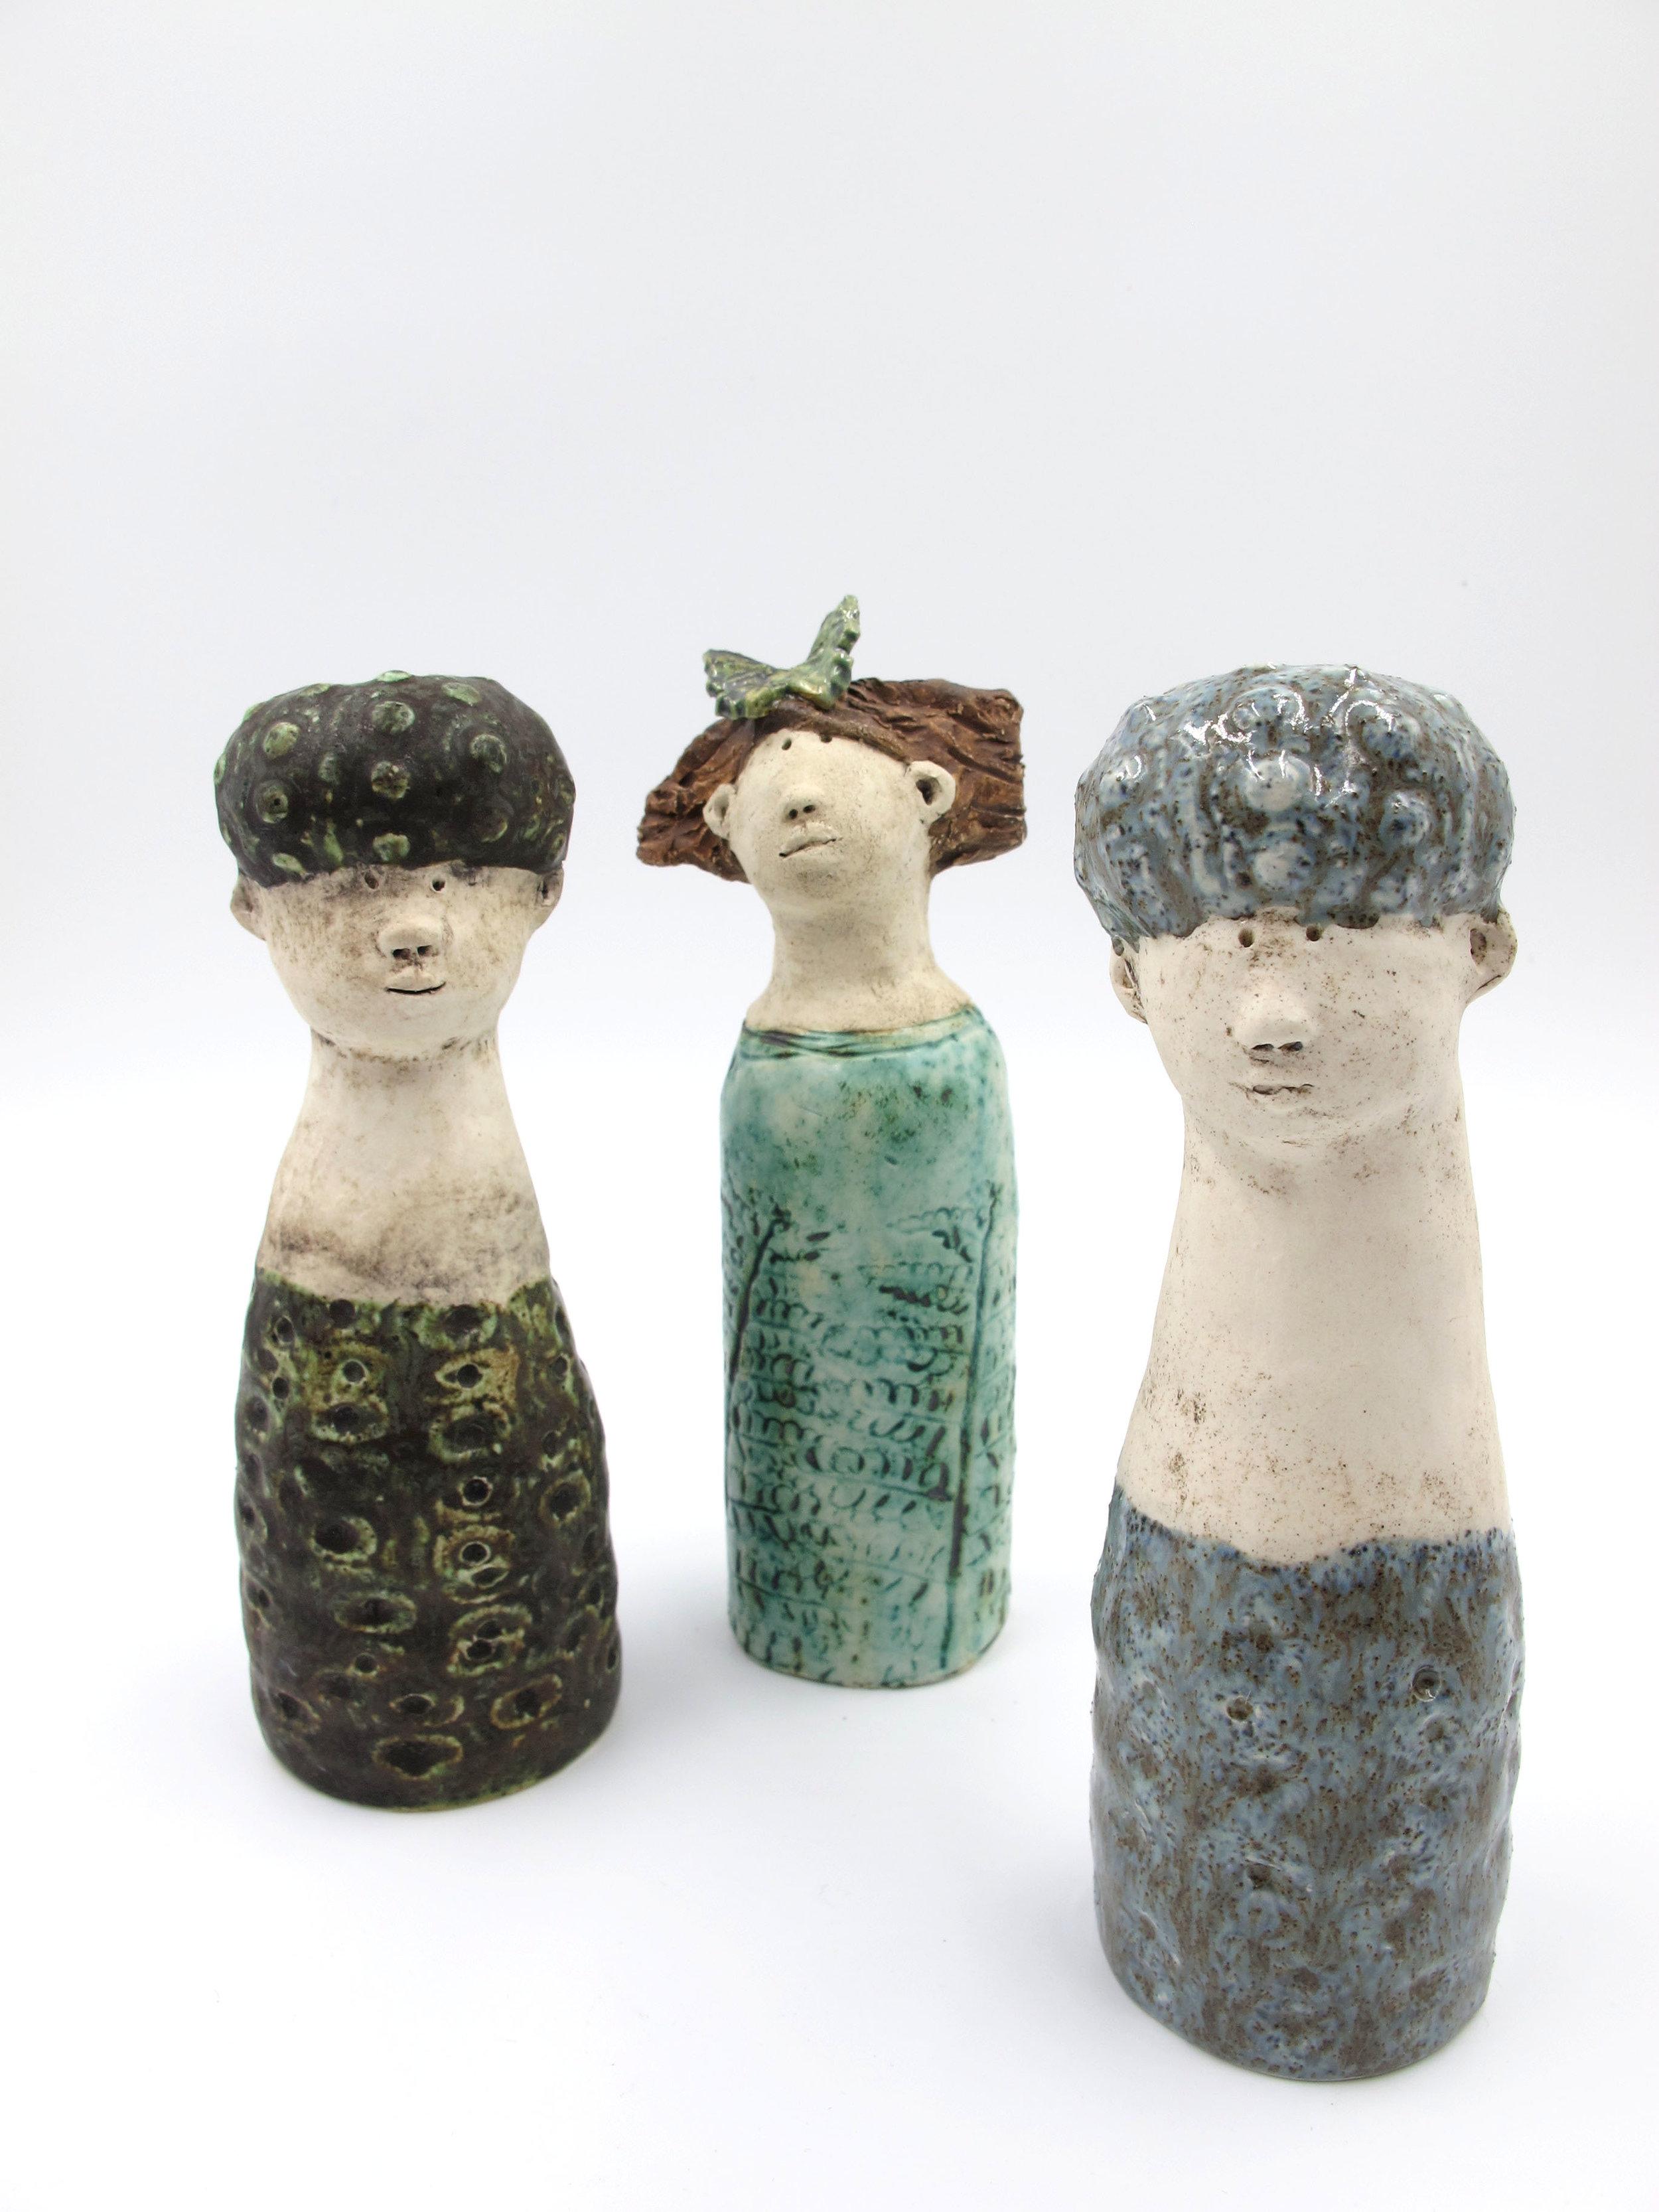 Handmade ceramic figures by Victoria Atkinson